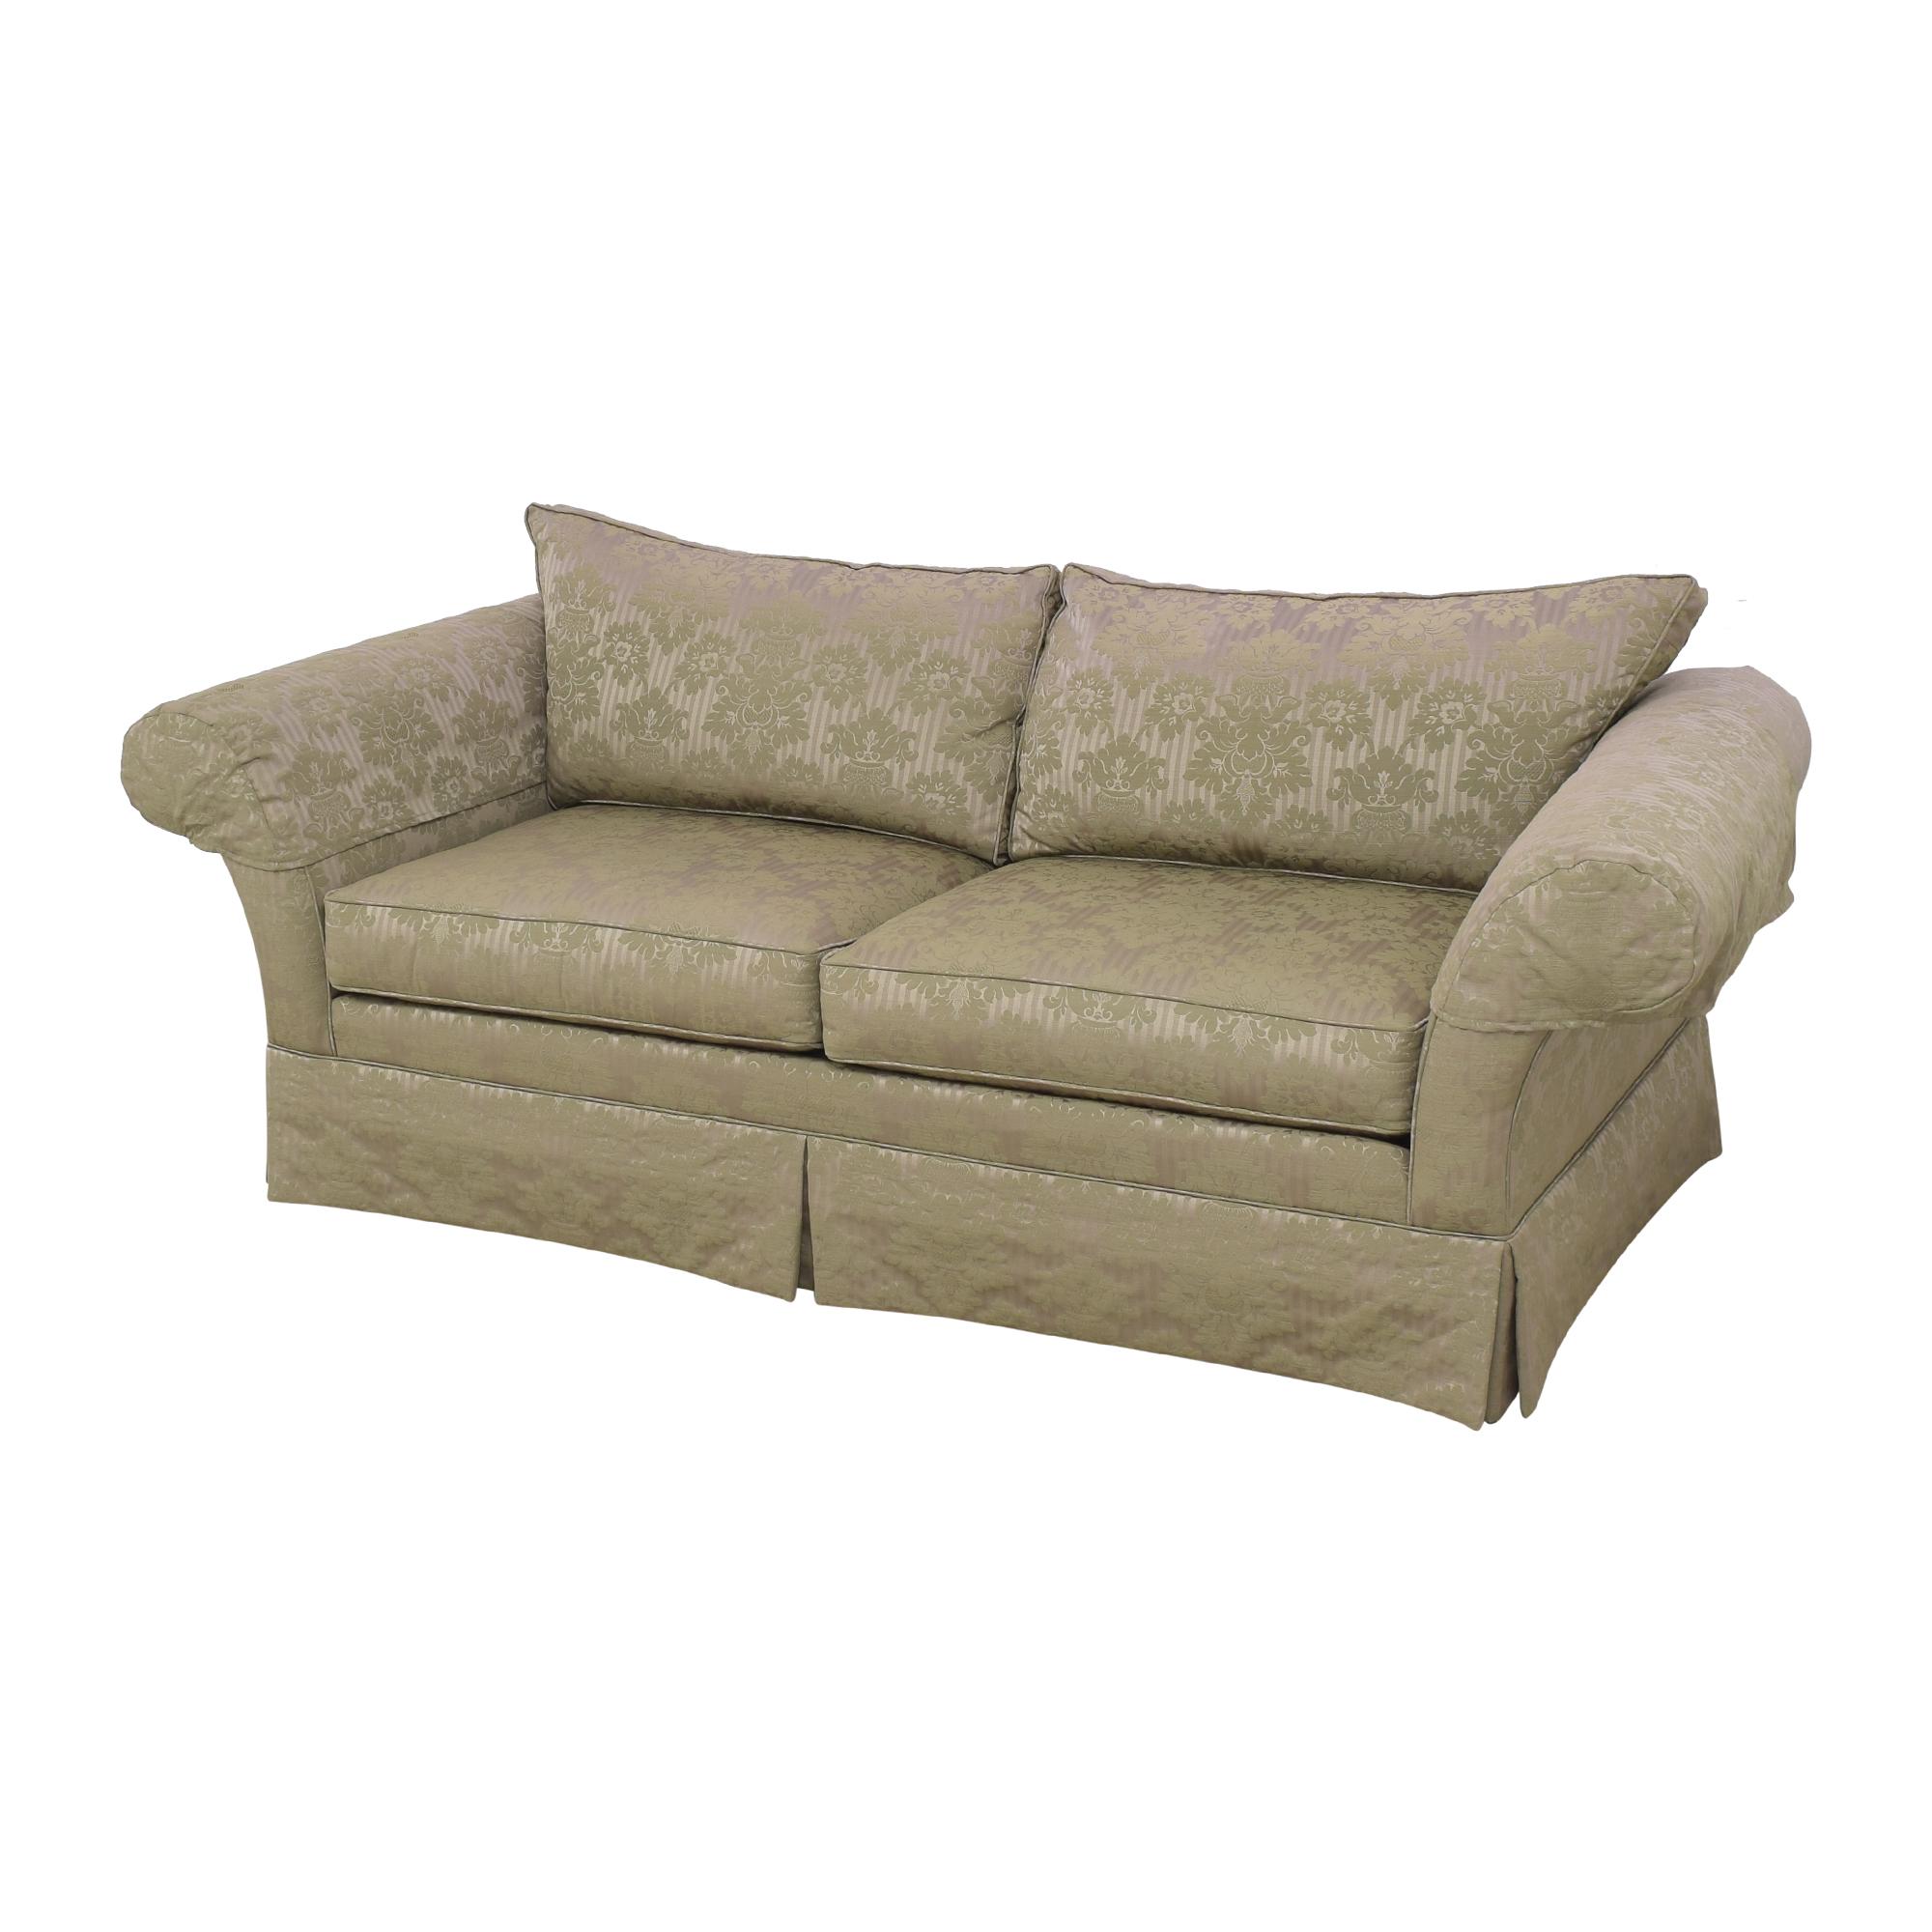 shop Ethan Allen Two Cushion Roll Arm Sofa Ethan Allen Classic Sofas